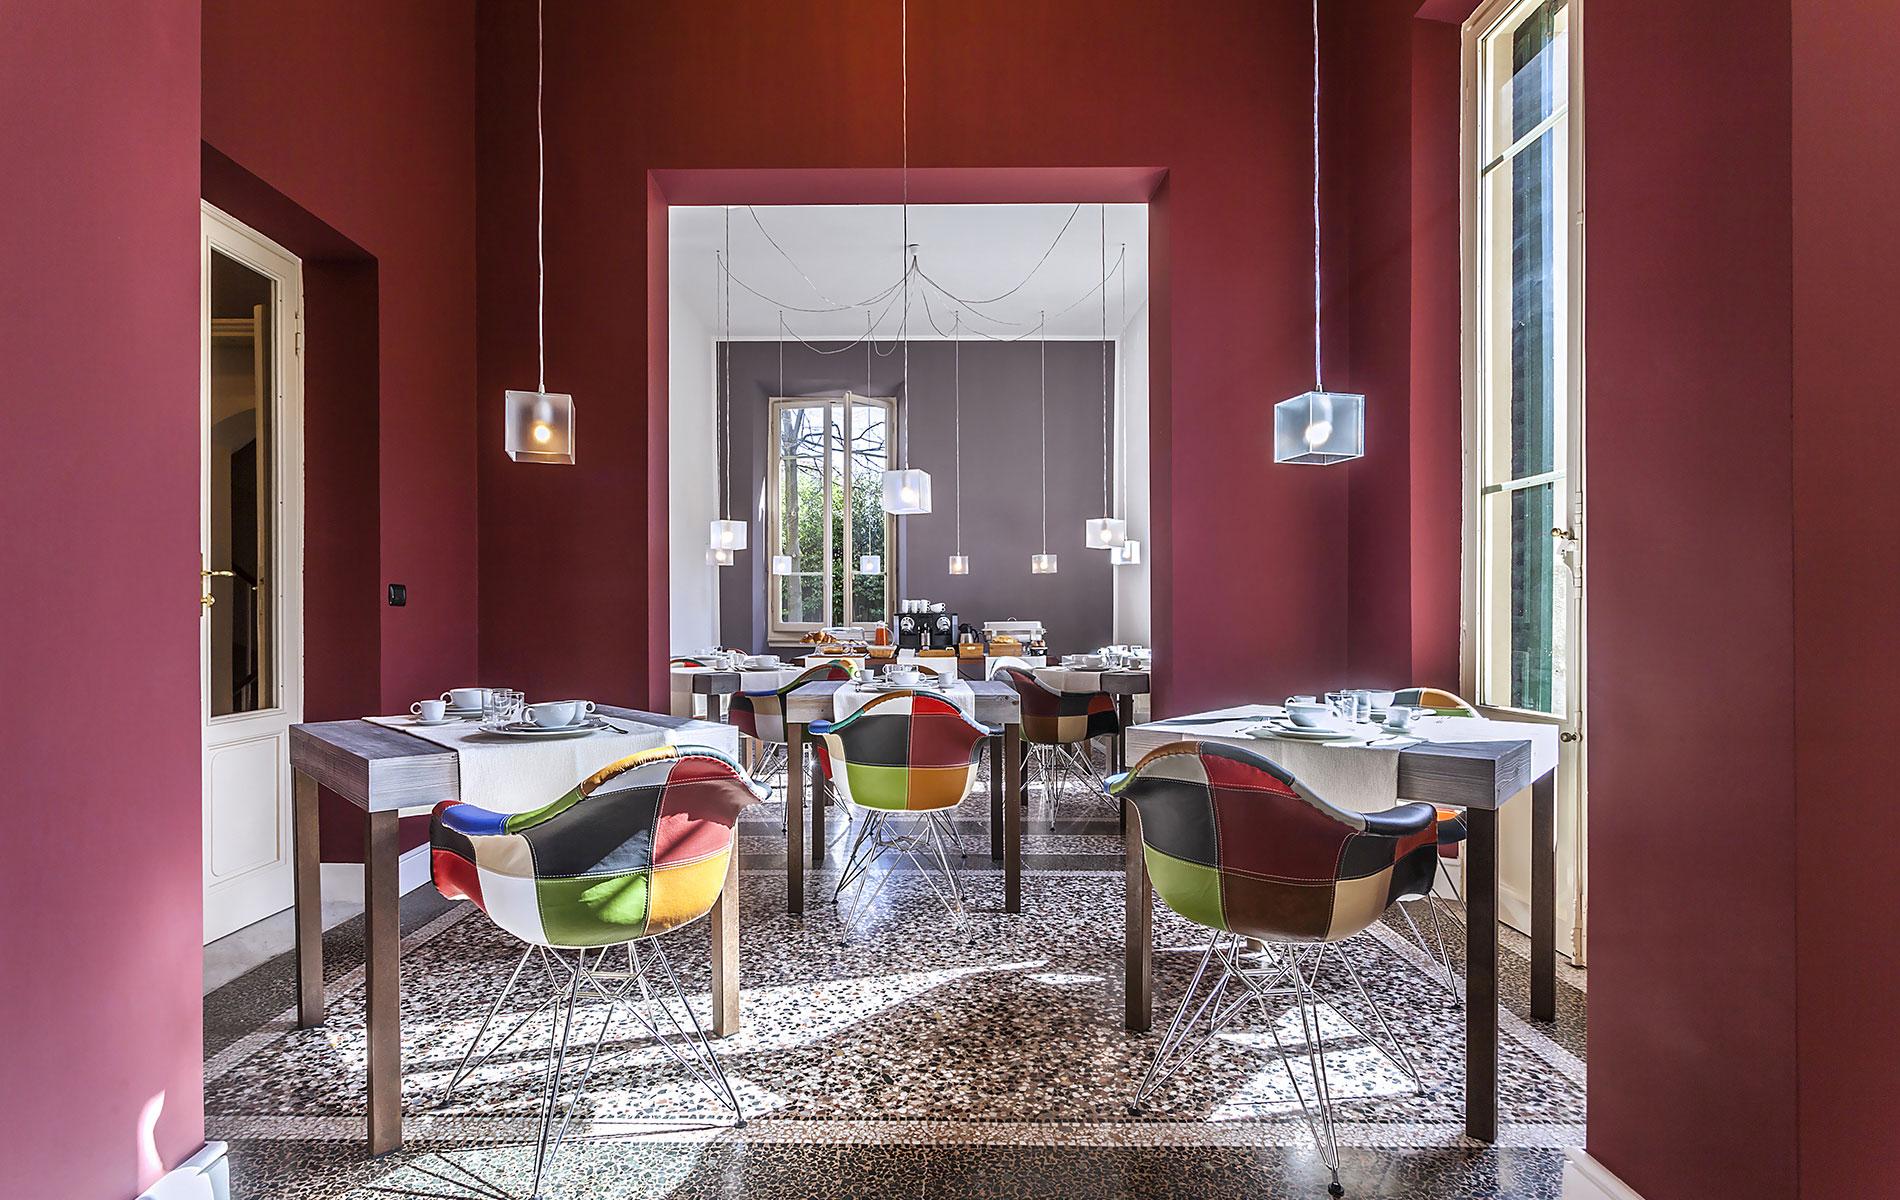 Hotel astro mediceo a 3 stars design hotel in florence for Designhotel florenz